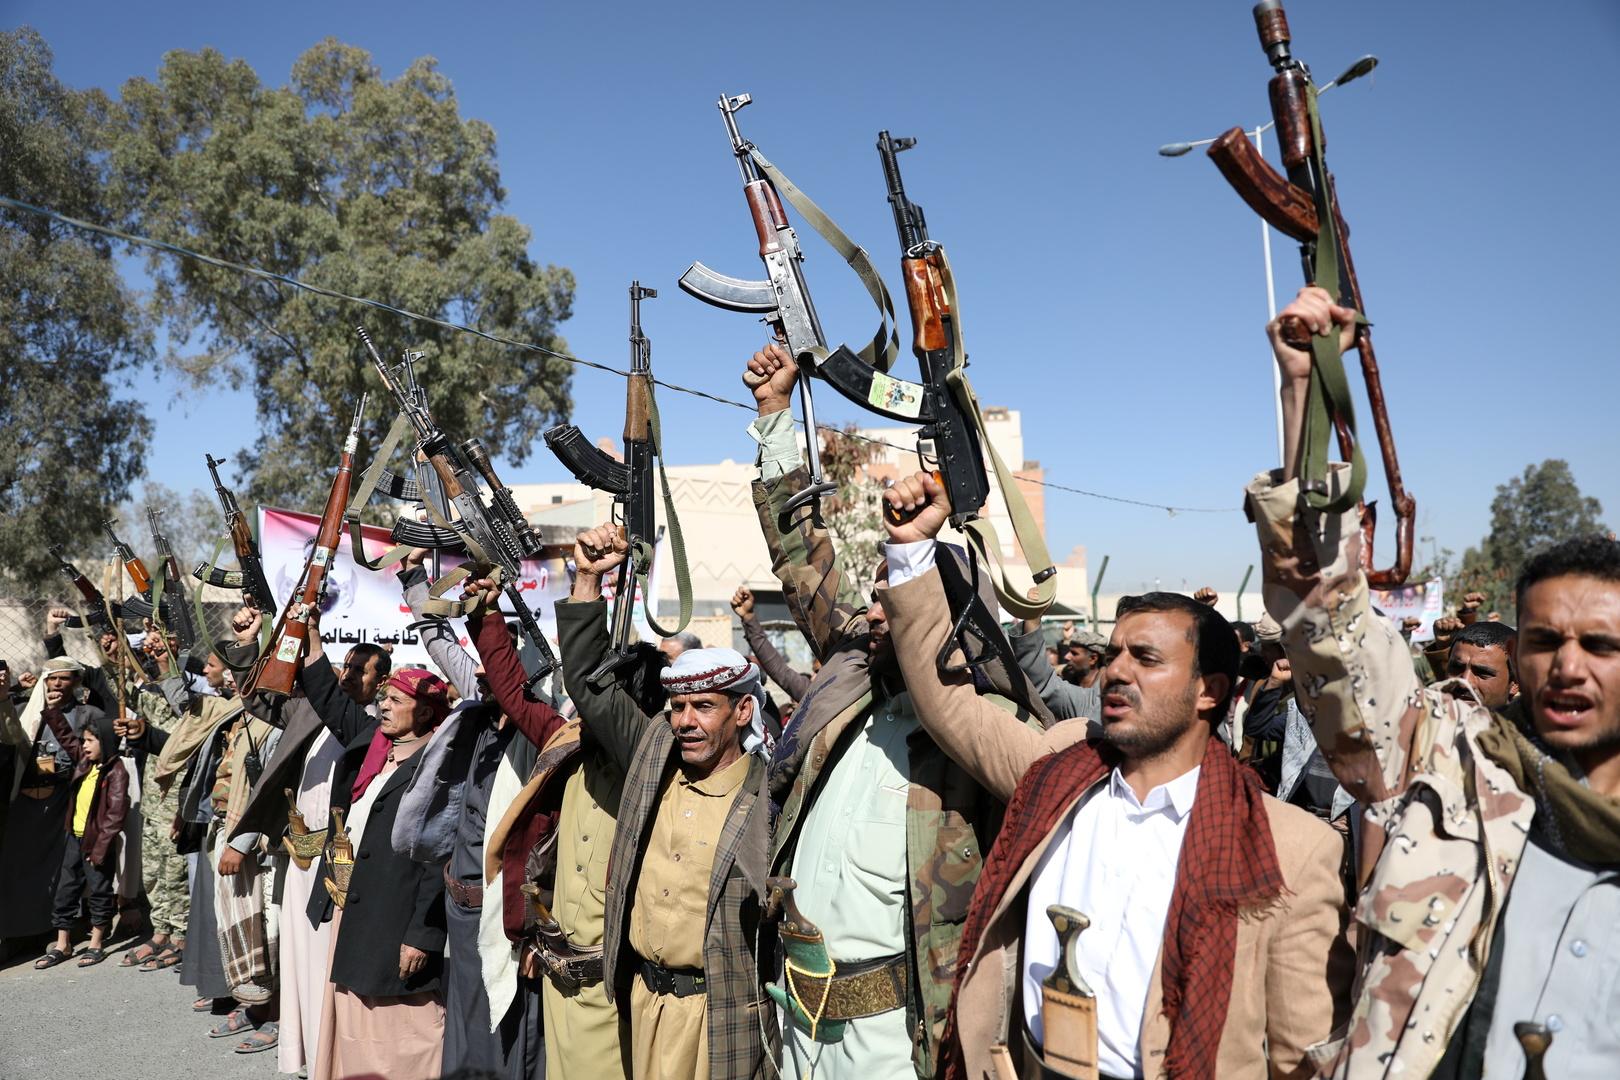 الحوثيون يتهمون واشنطن بدعم وتحريك